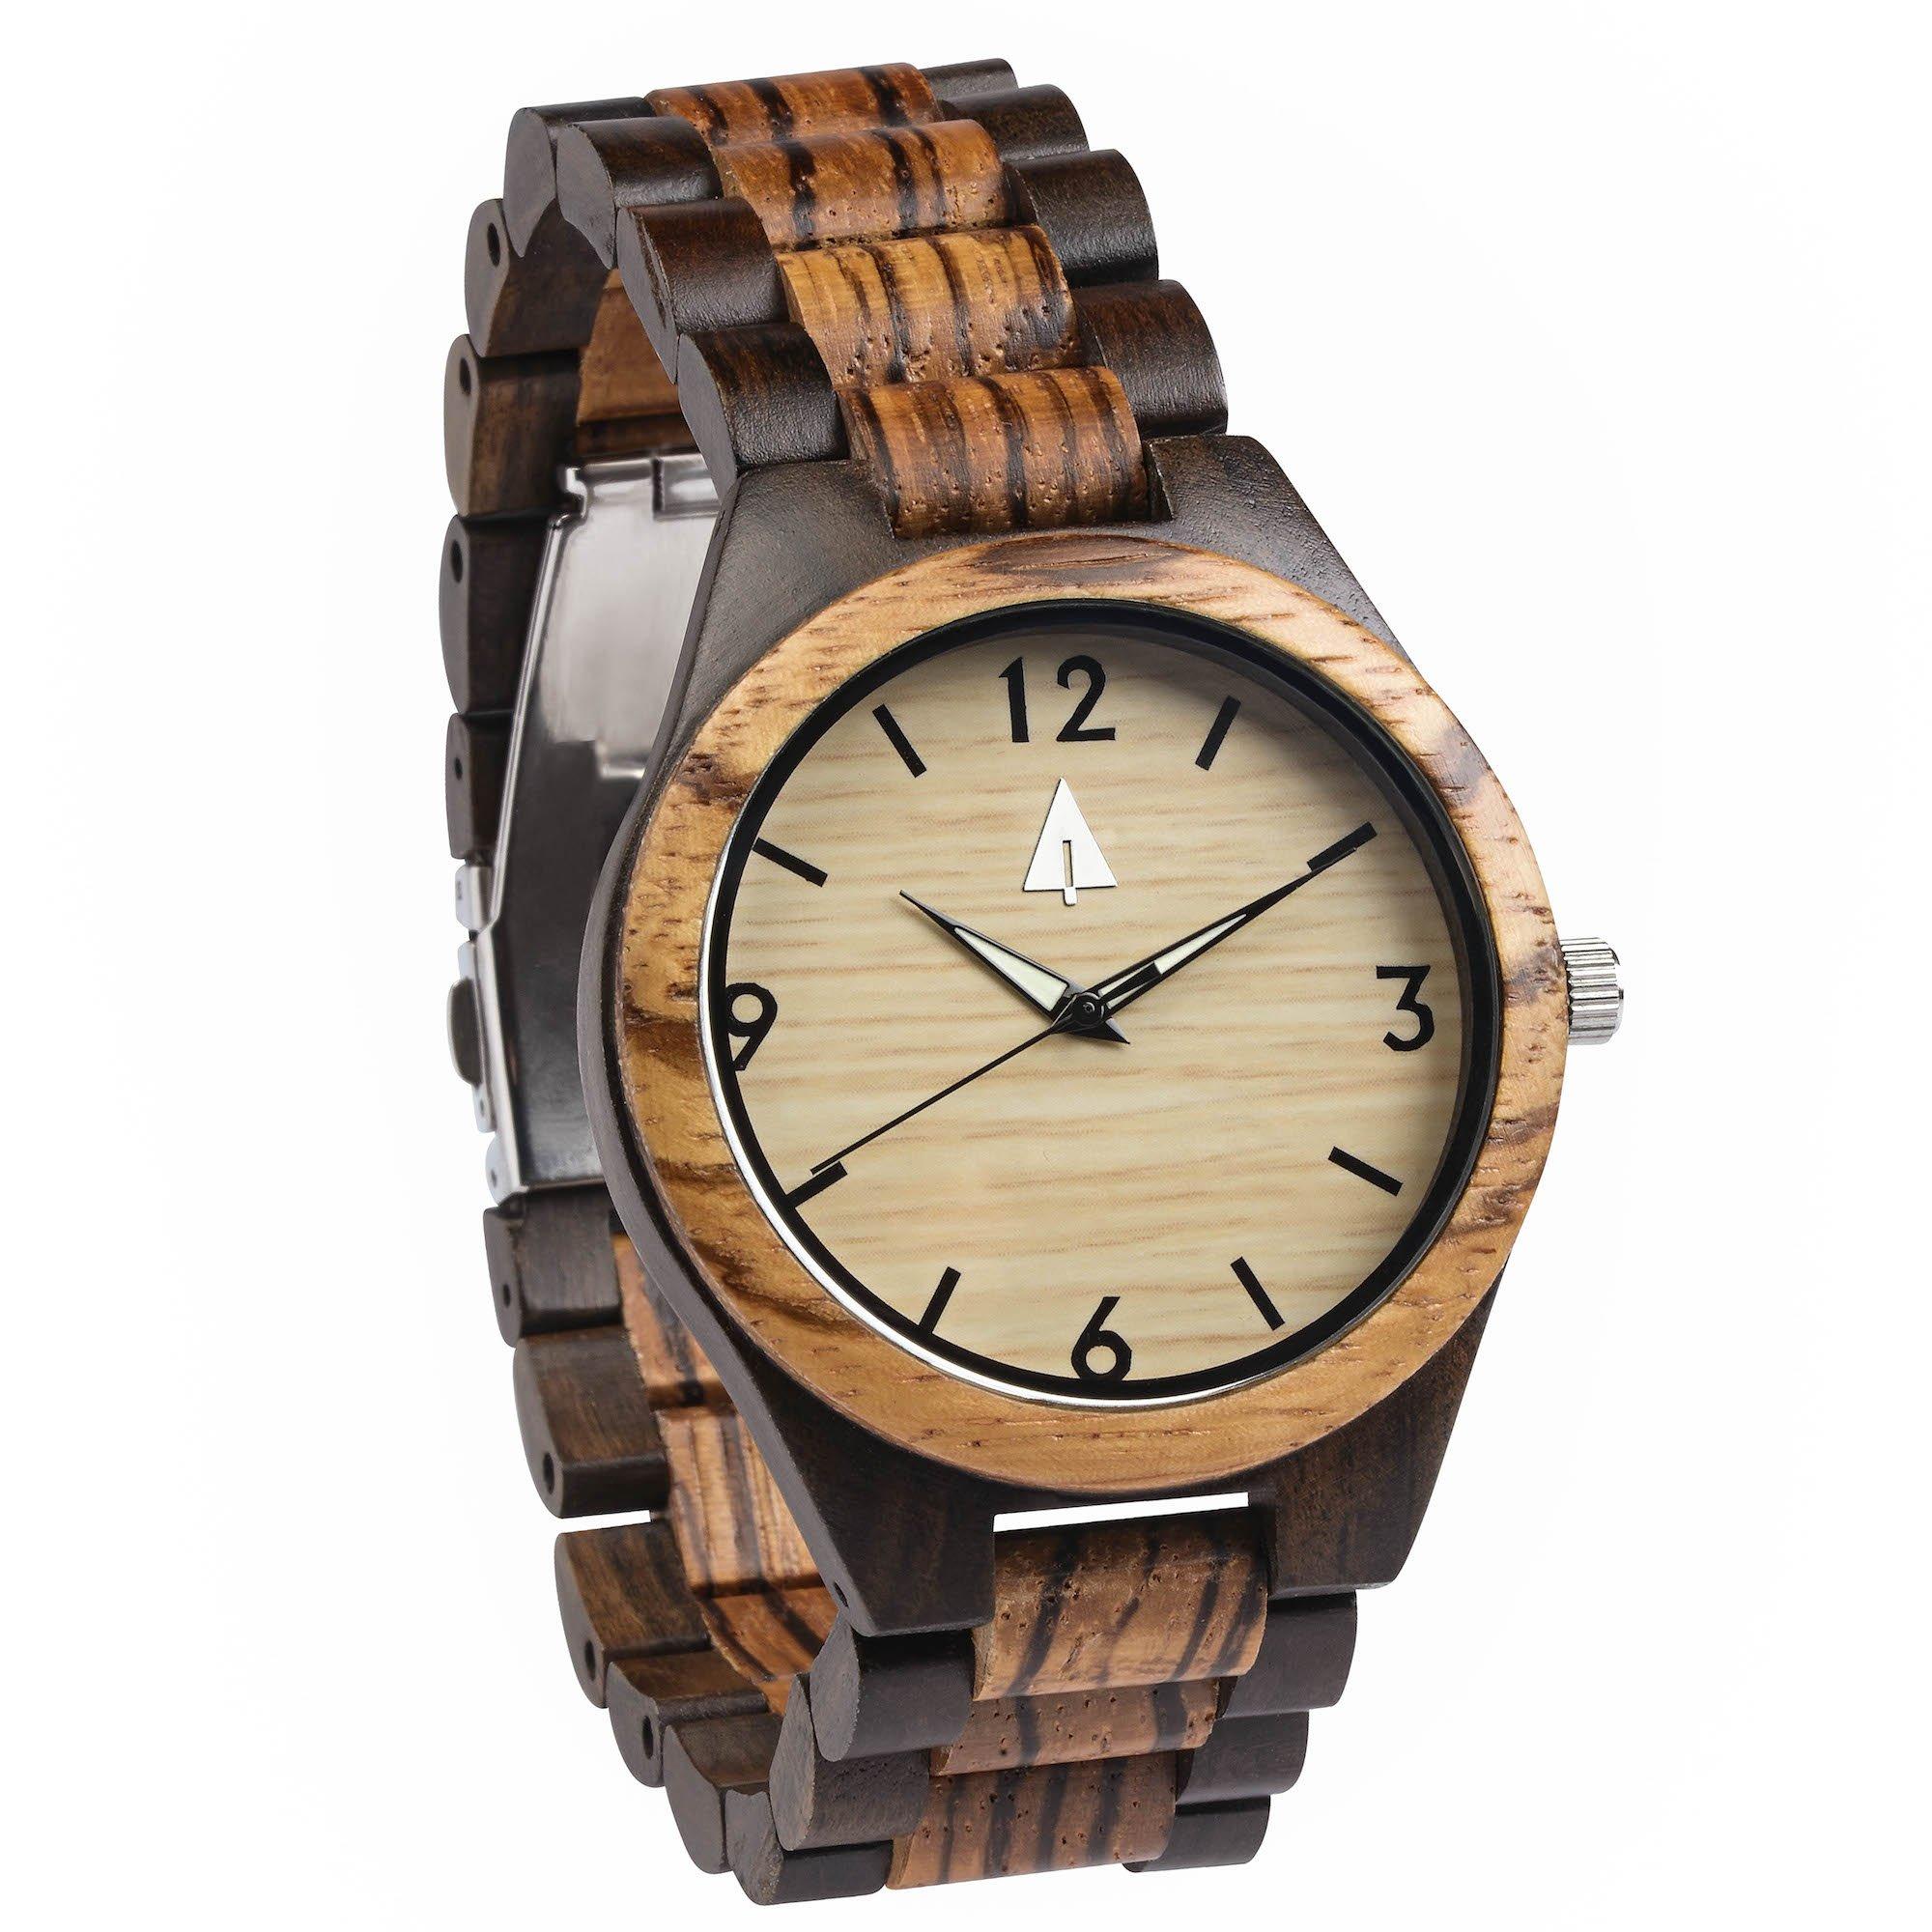 Treehut Zebrawood and Ebony Wooden Men's Watch – Tri-Fold Clasp – Stainless S... by treehut